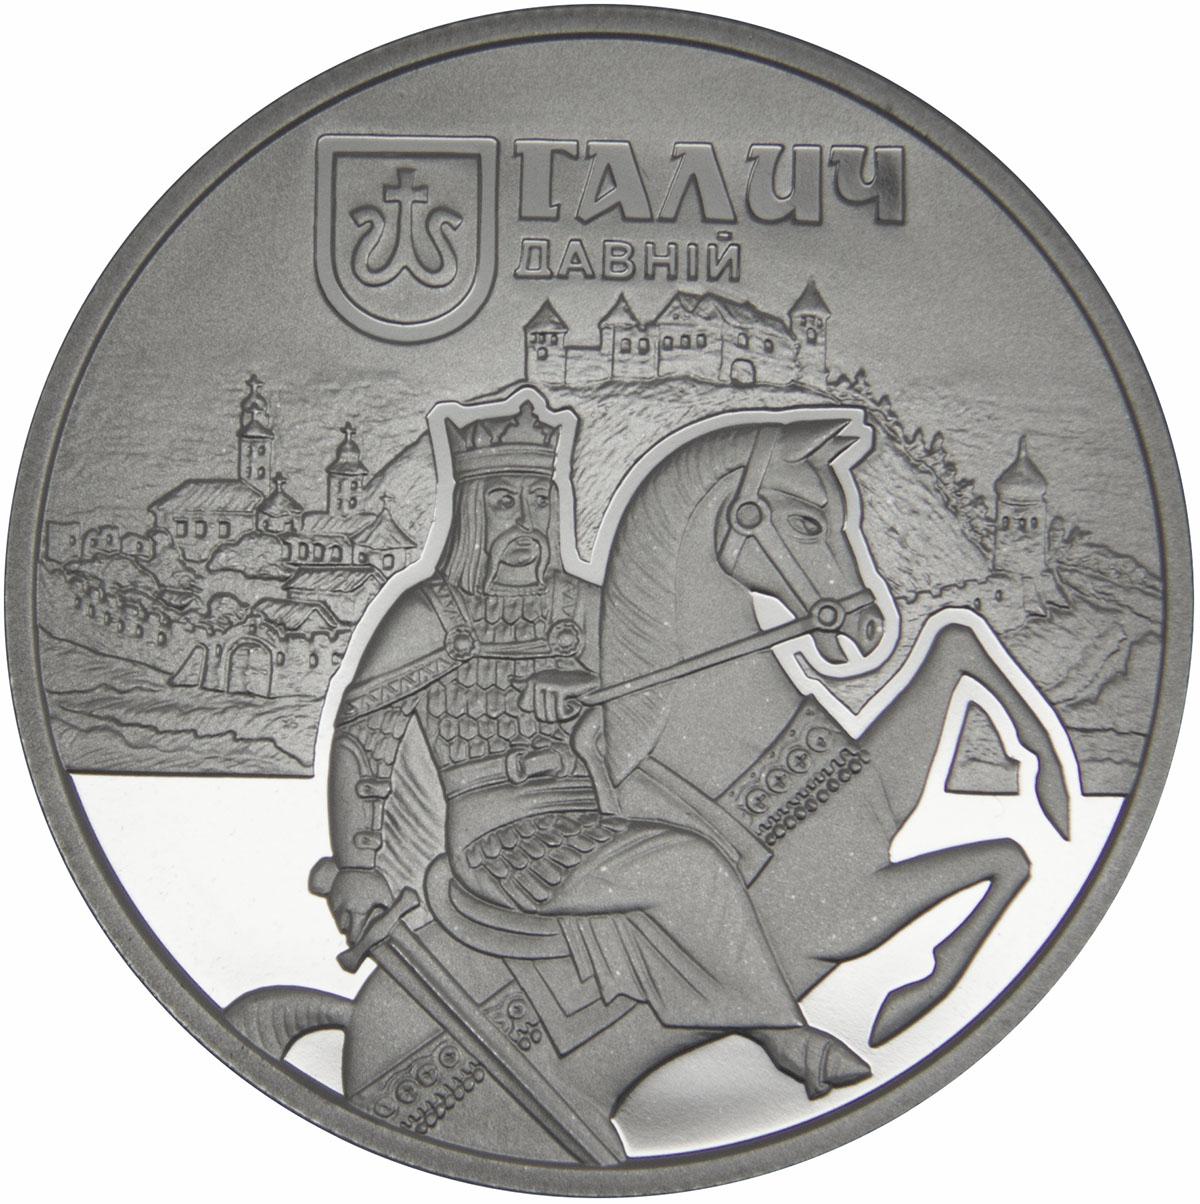 Монета номиналом 5 гривен Древний Галич. Нейзильбер. Украина, 2017 год монета номиналом 2 гривны михайло дерегус нейзильбер украина 2004 год